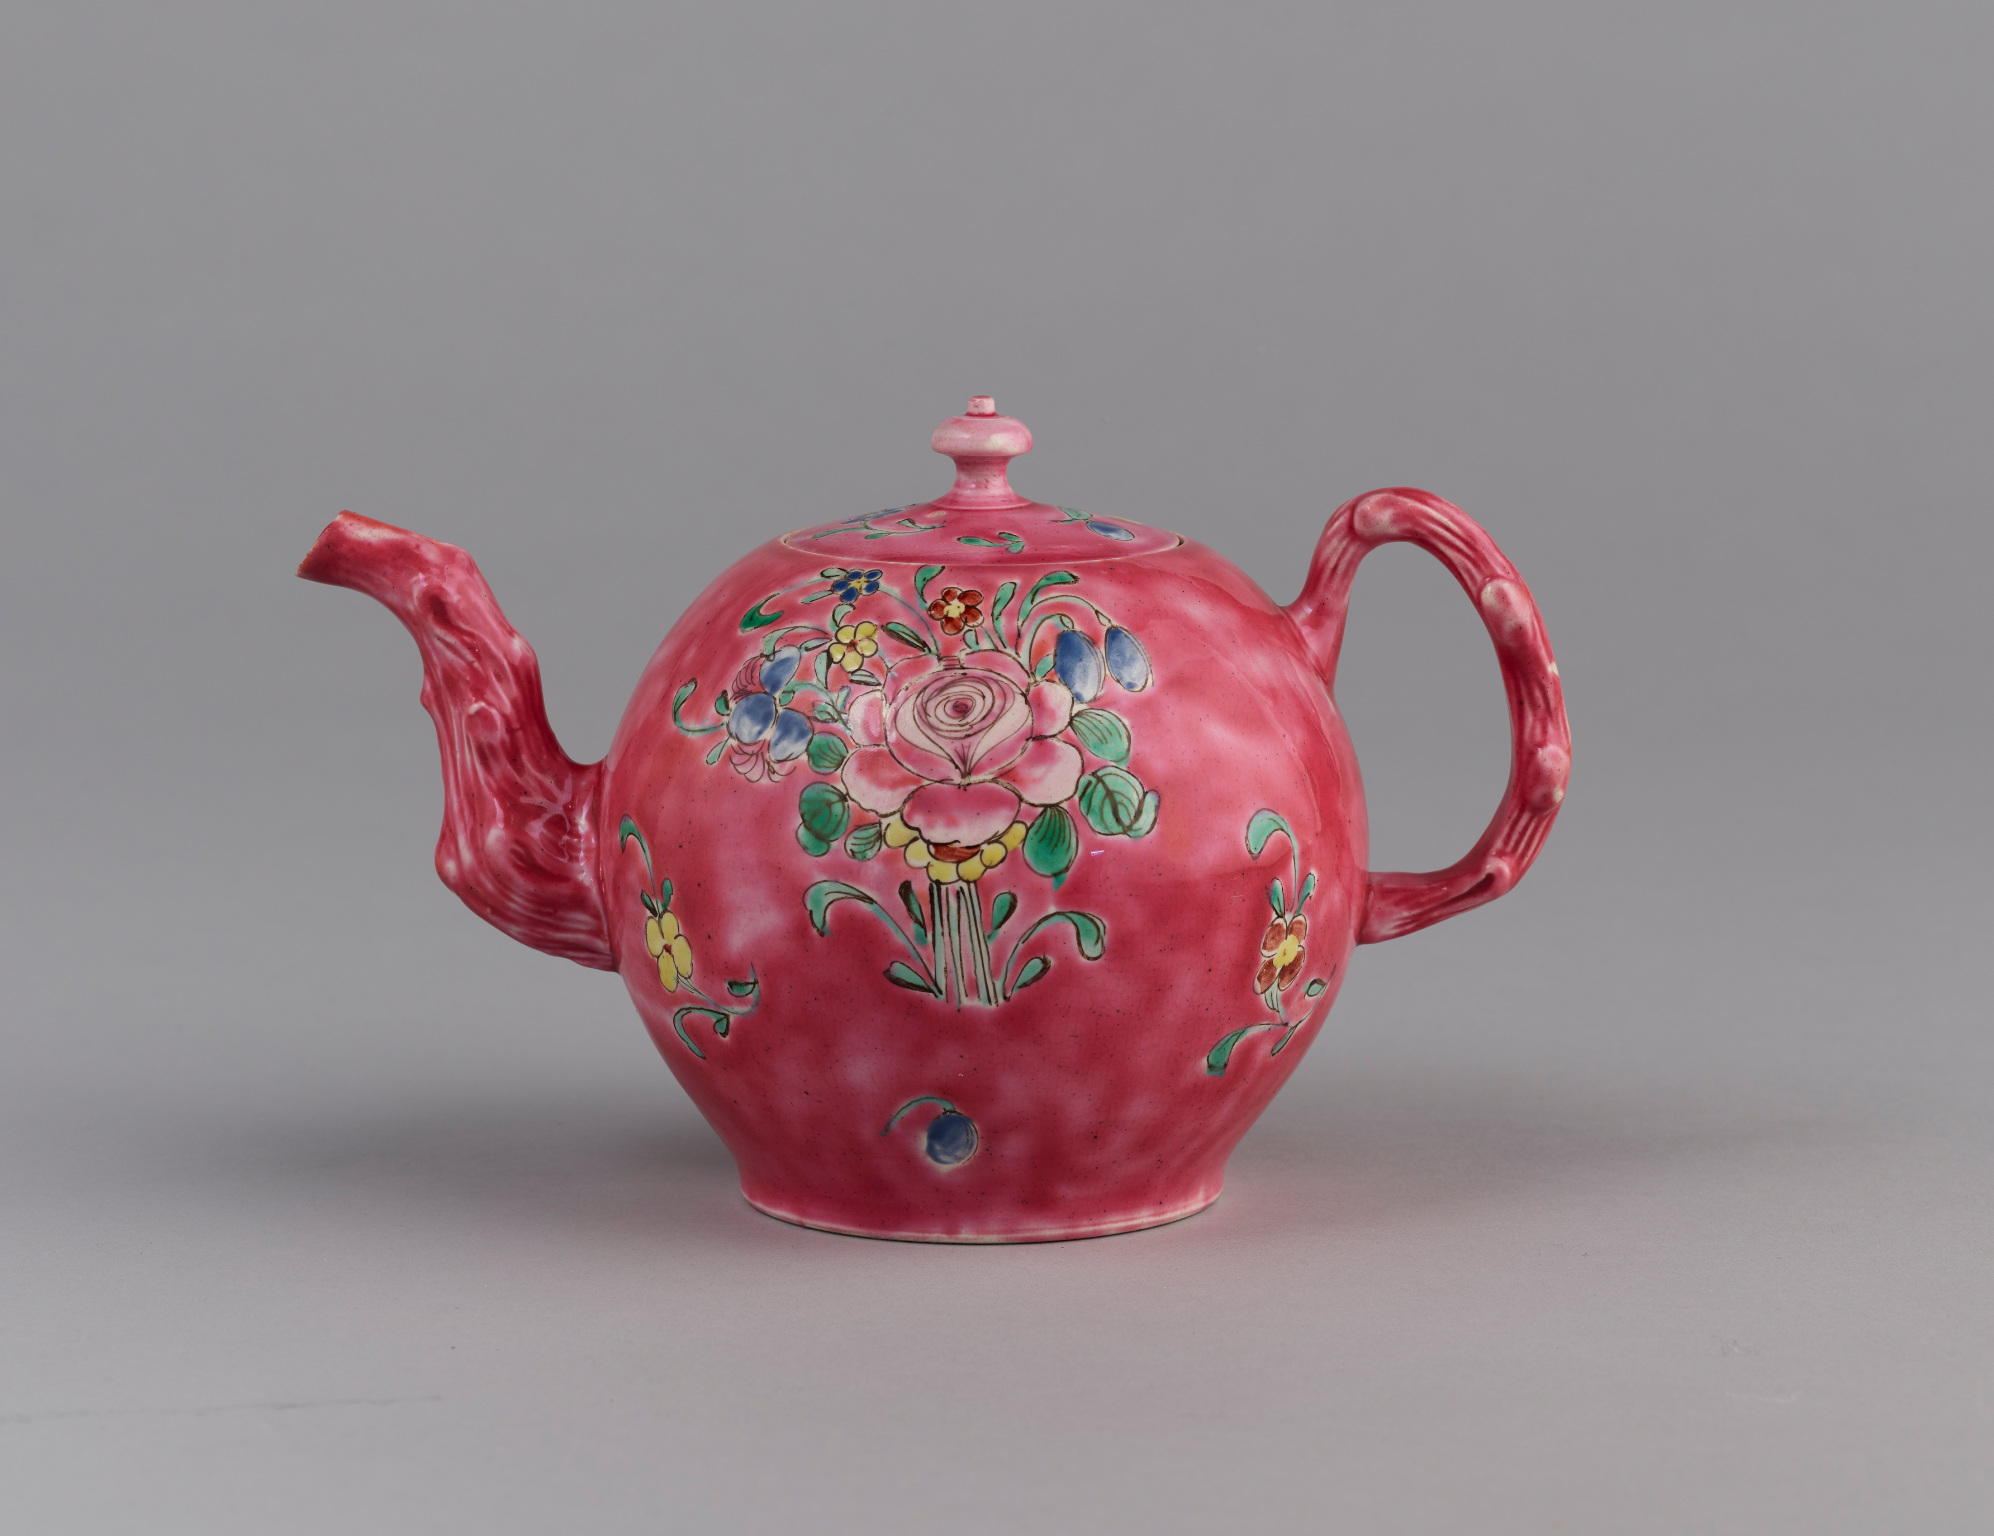 Staffordshire salt glazed tea pot and cover, Haughton Gallery